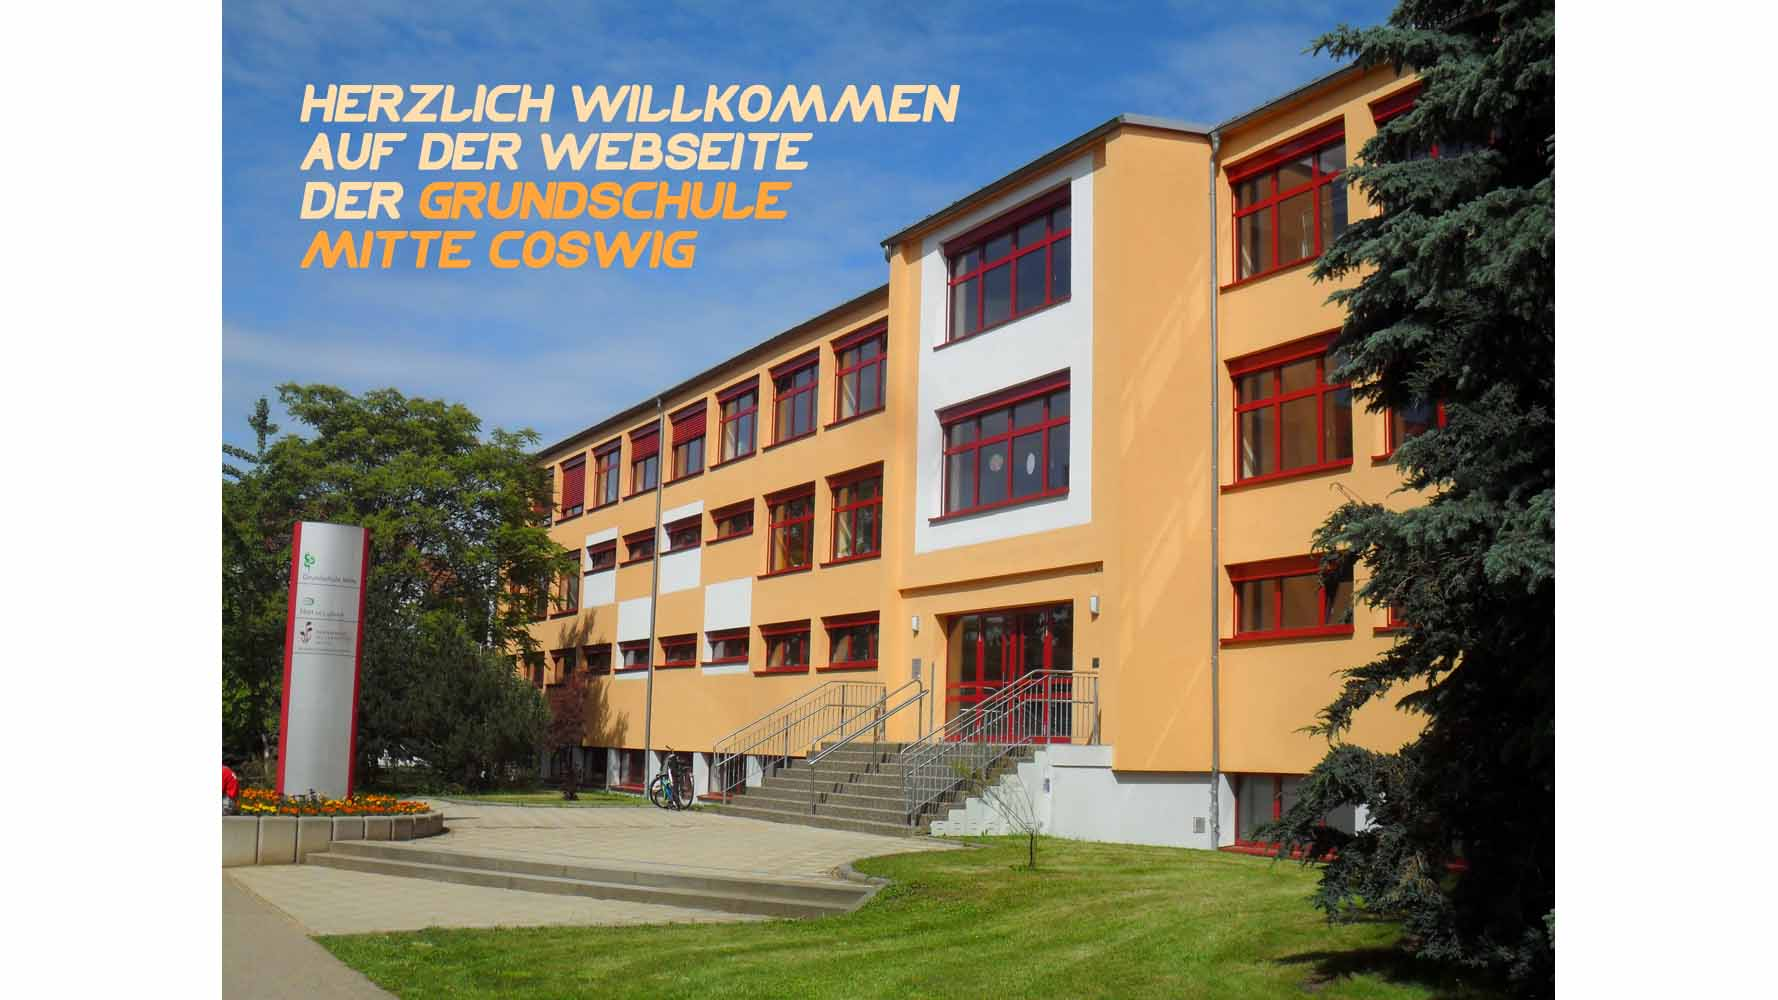 Grundschule Mitte Coswig